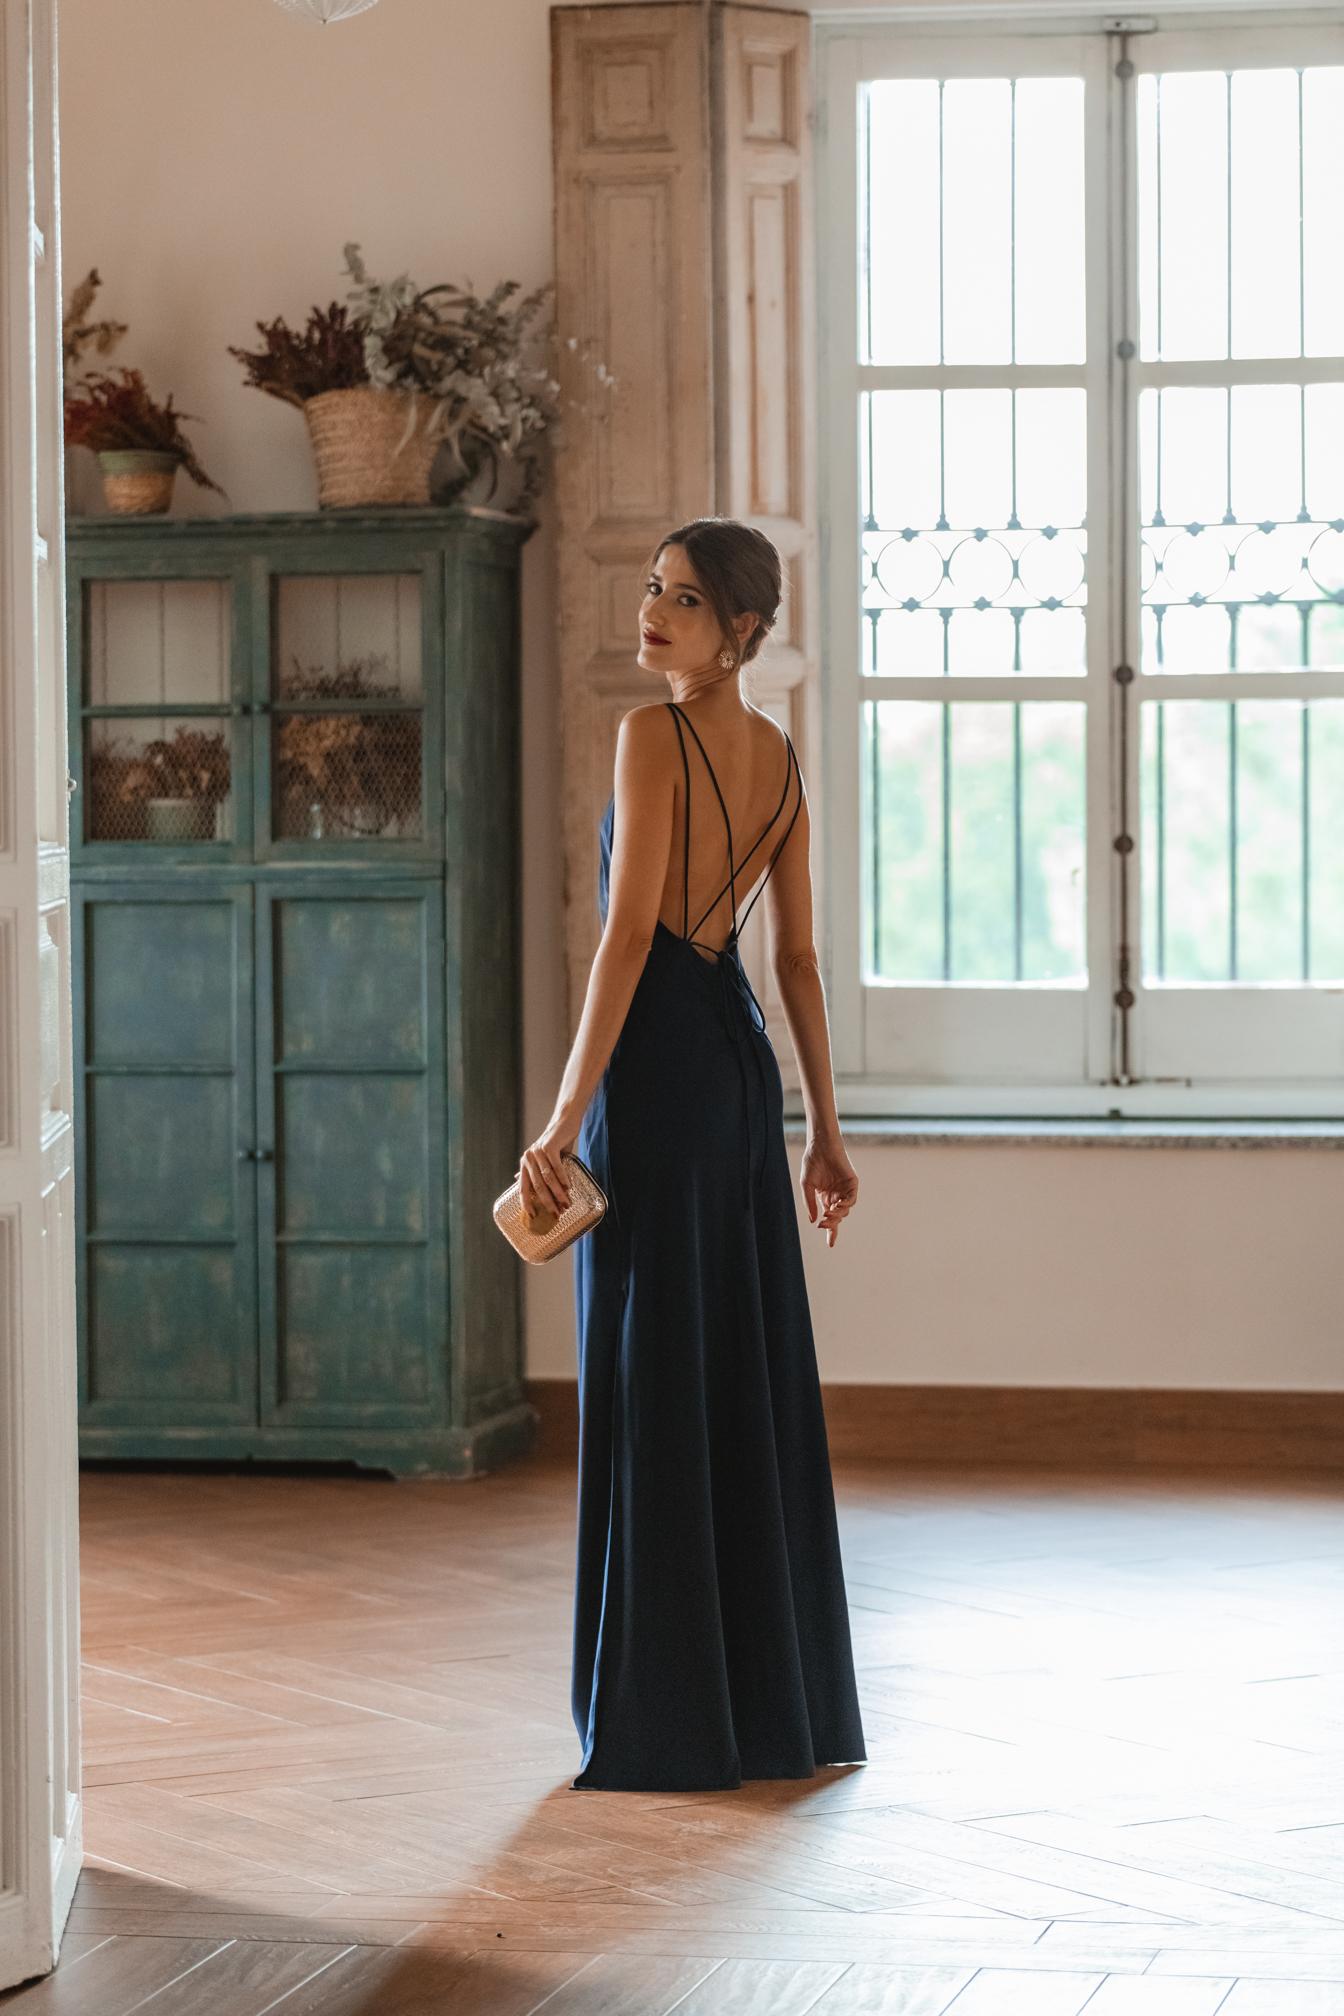 invitada perfecta noche vestido azul espalda